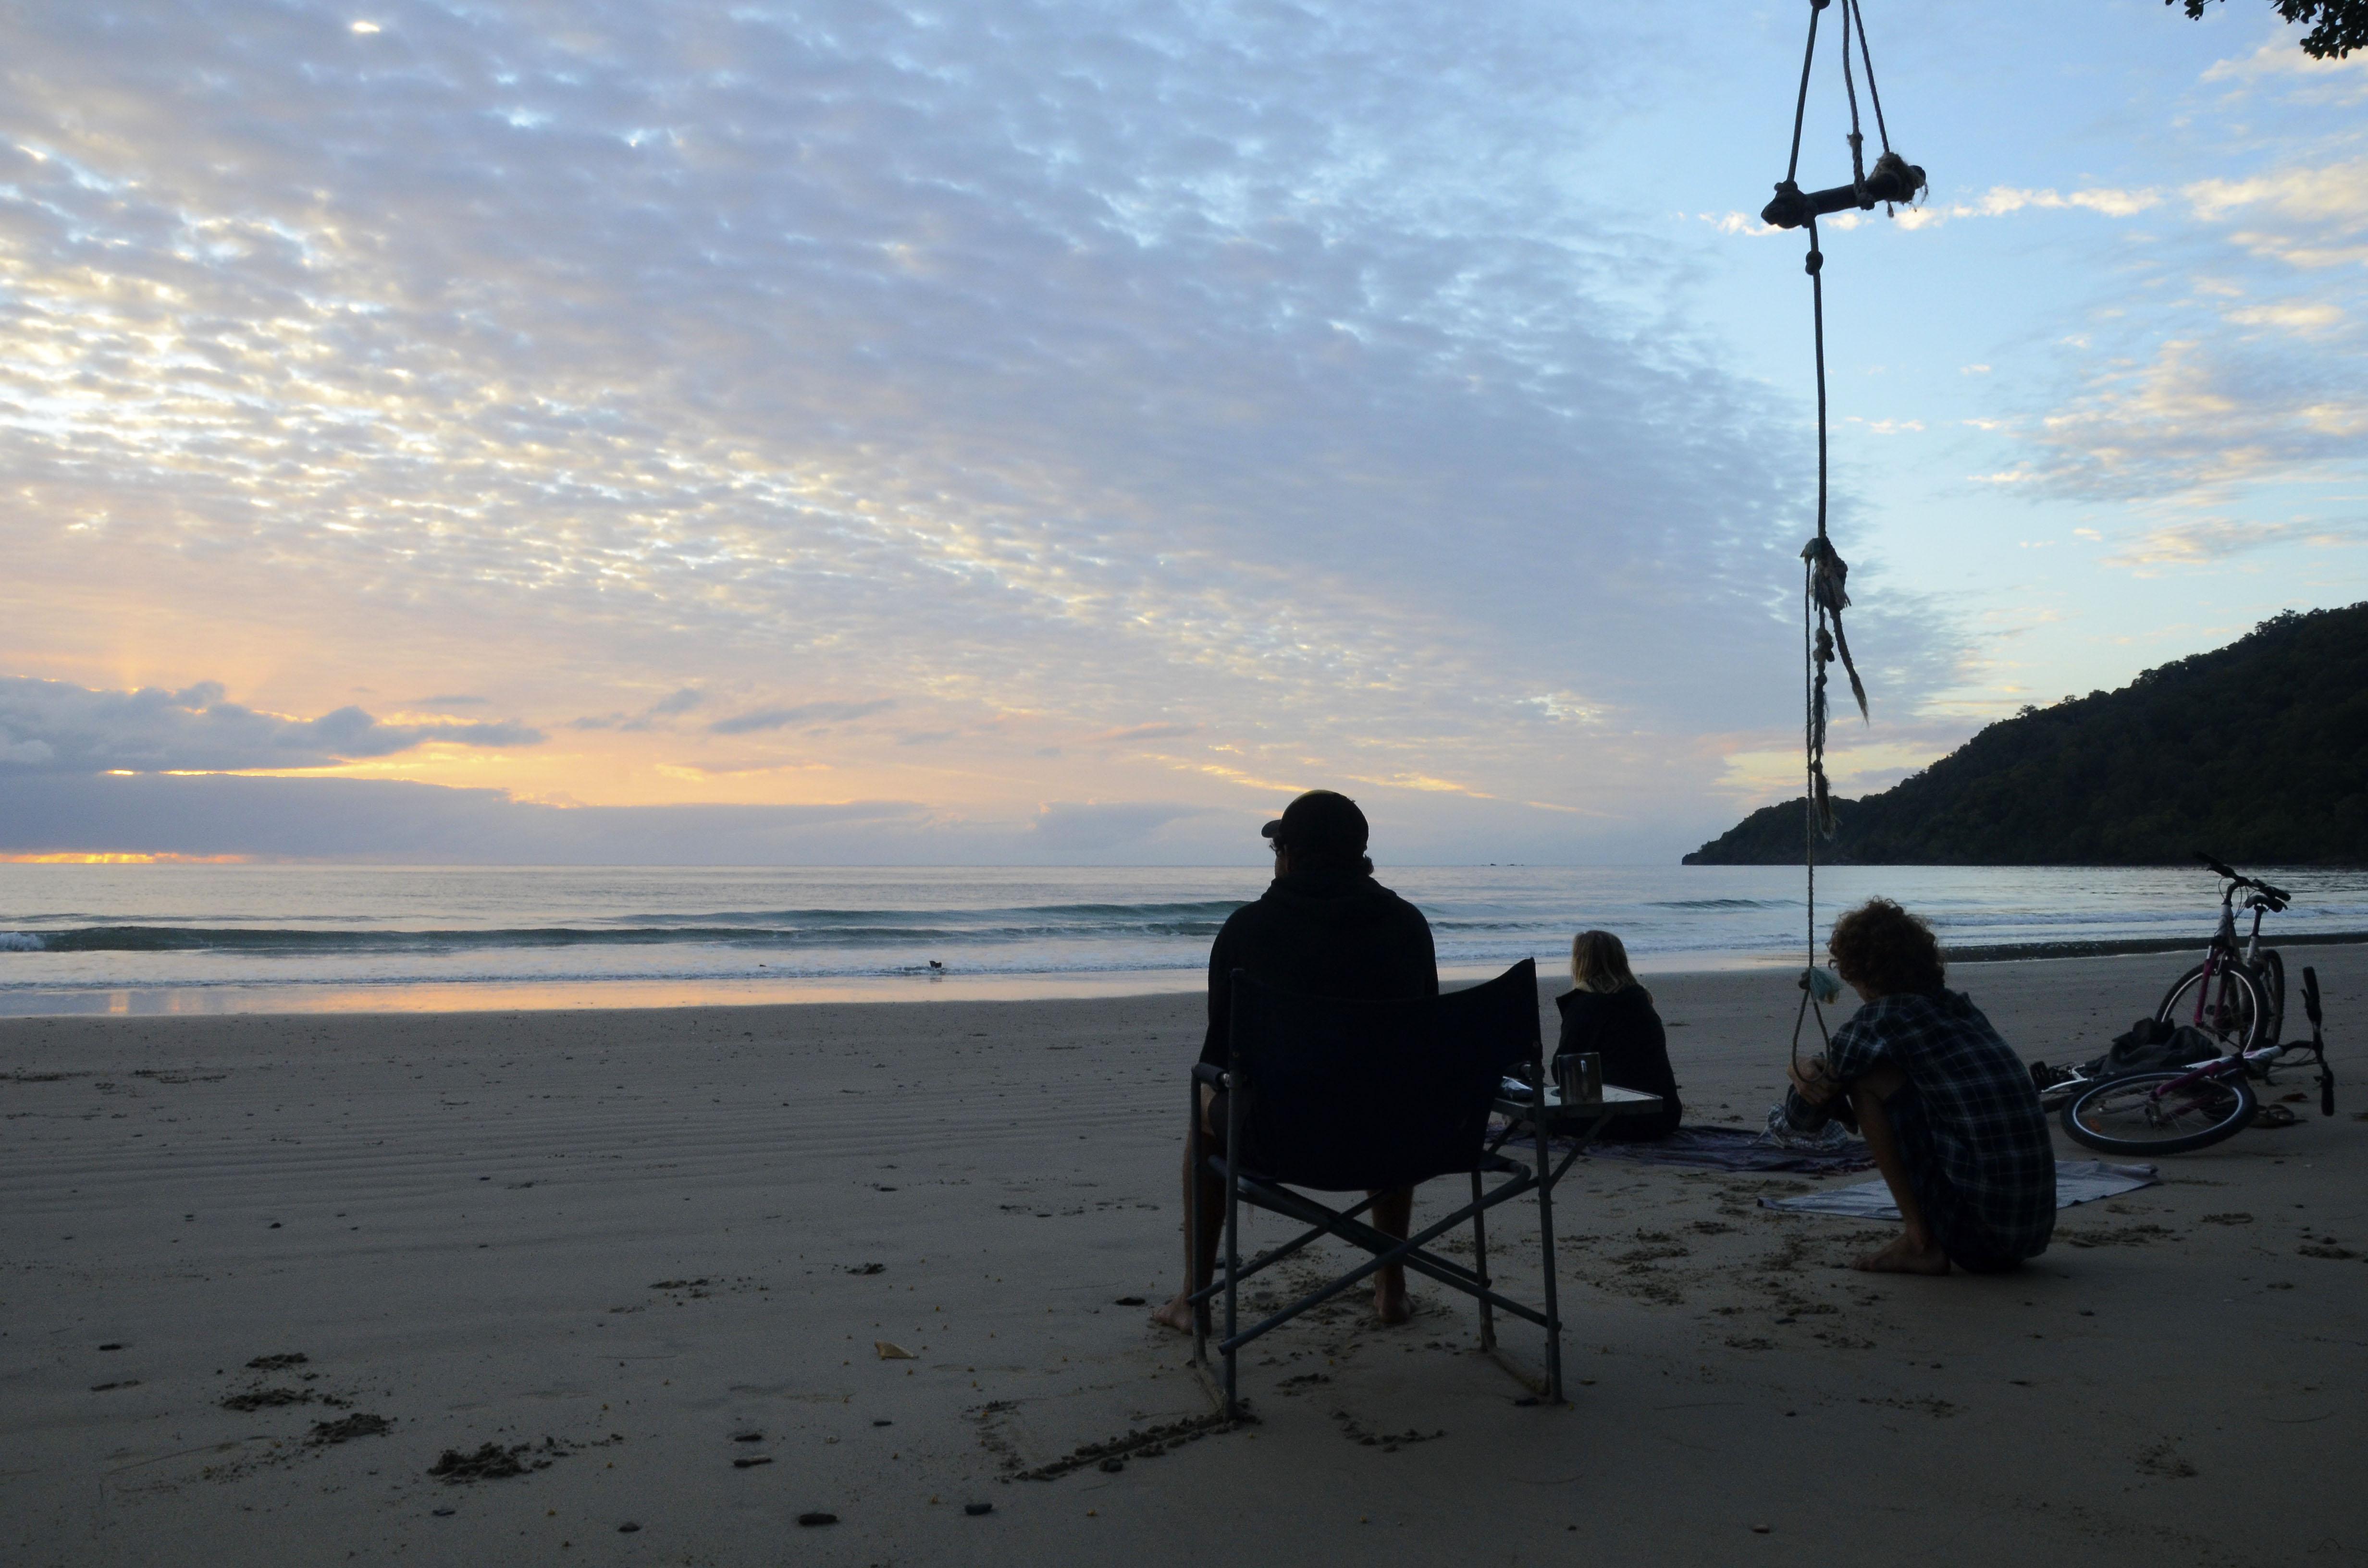 sunrise at cow bay